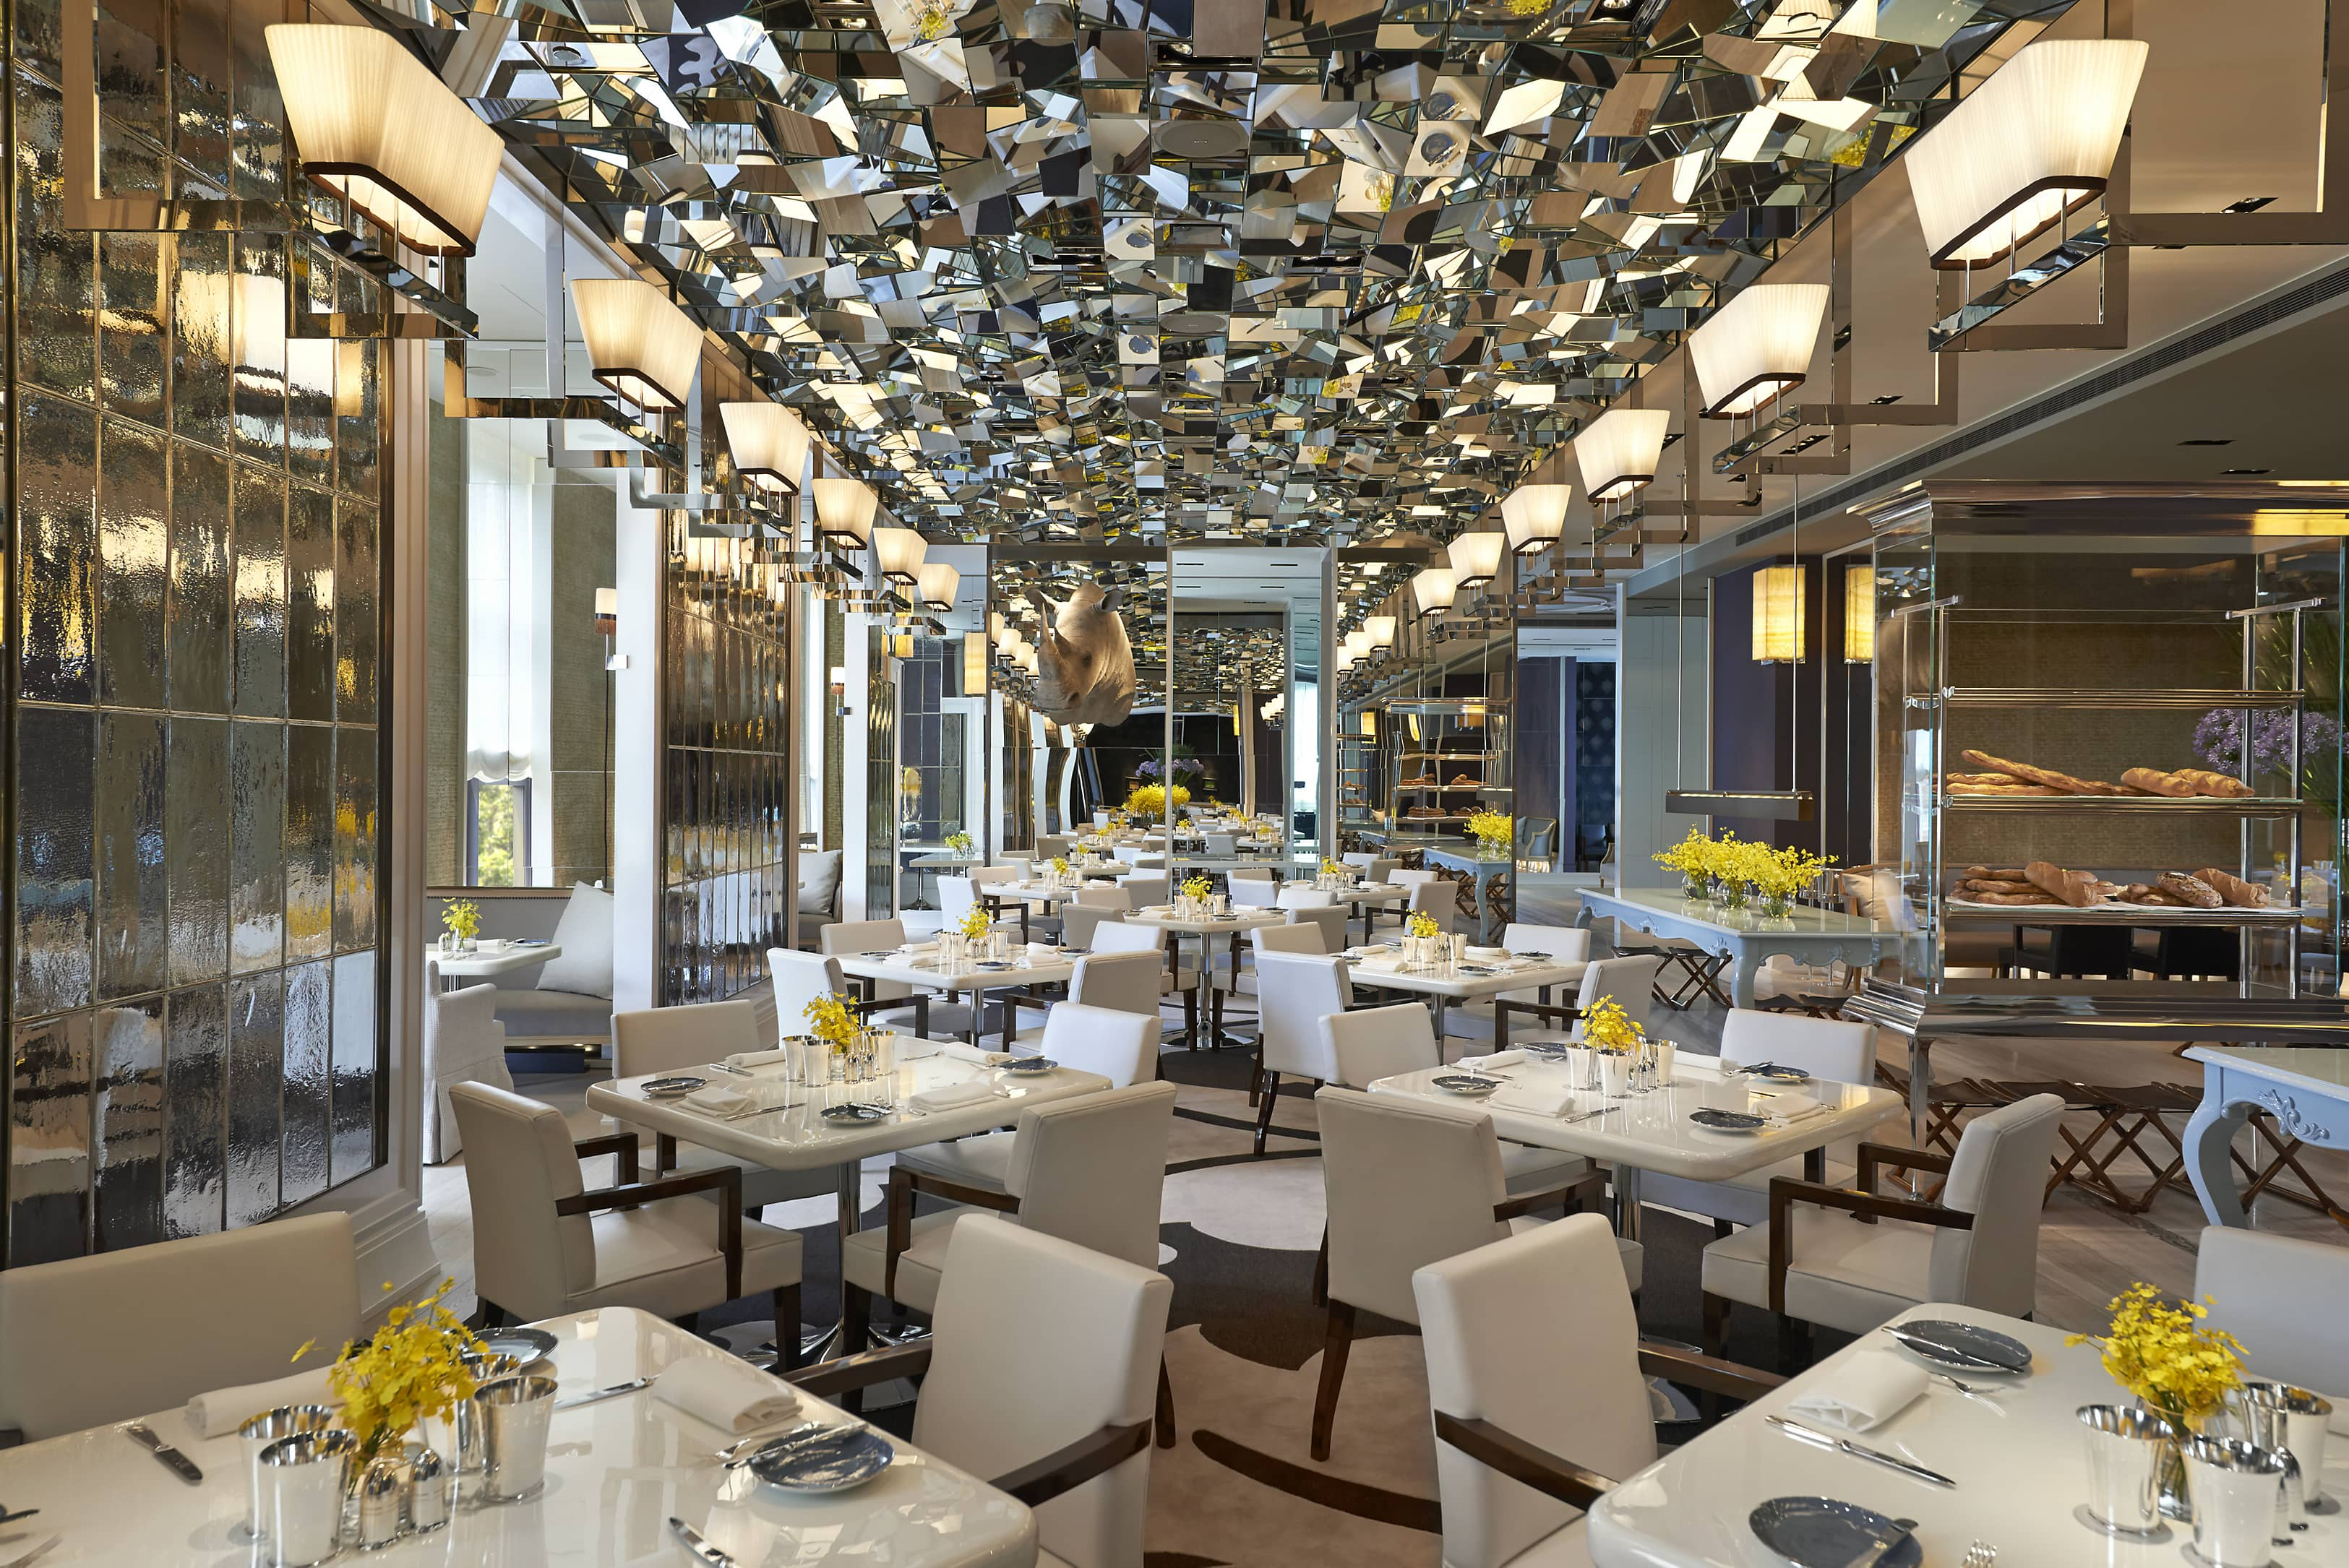 Gallery mandarin oriental hotel taipei - Hotel mandarin restaurante ...